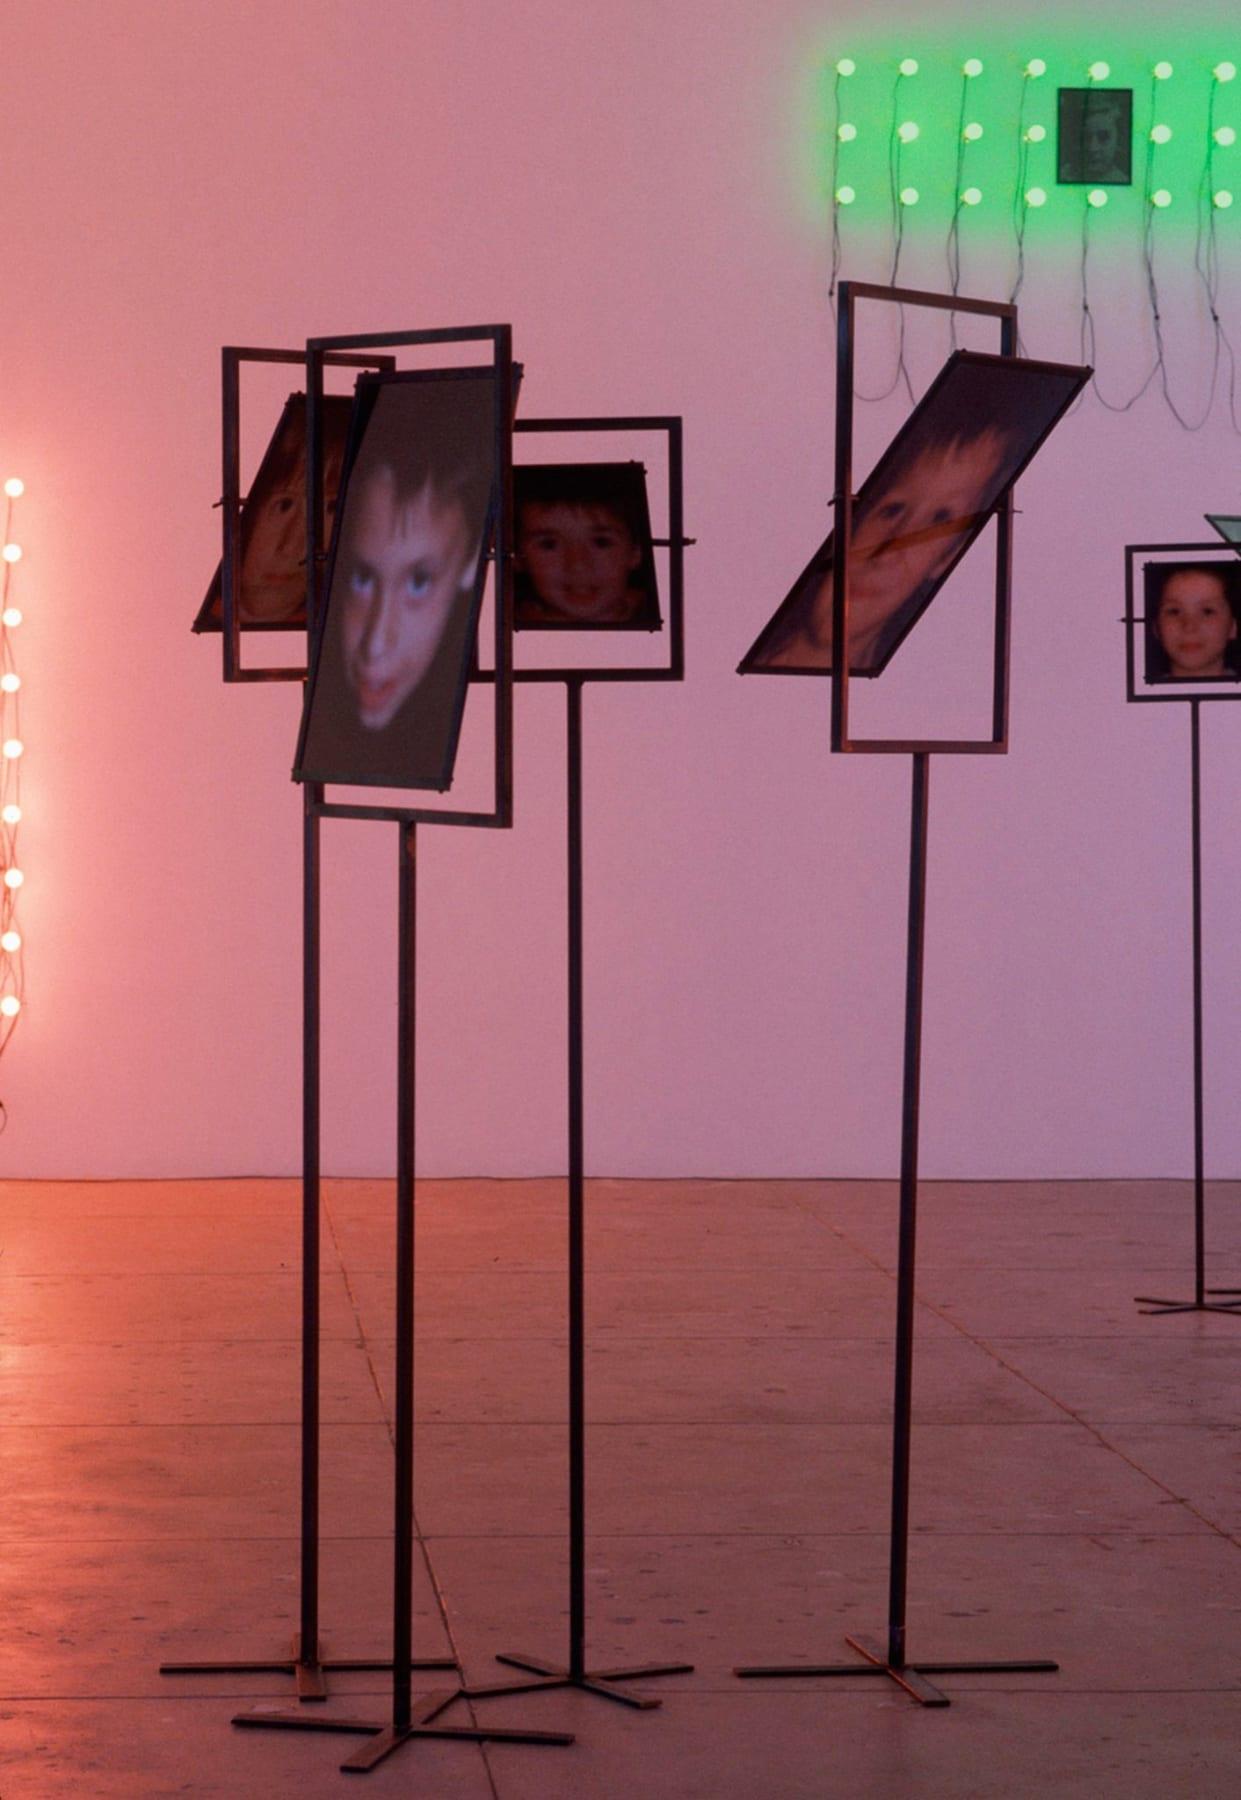 Christian Boltanski, Les Miroirs (4 photographs), 2000